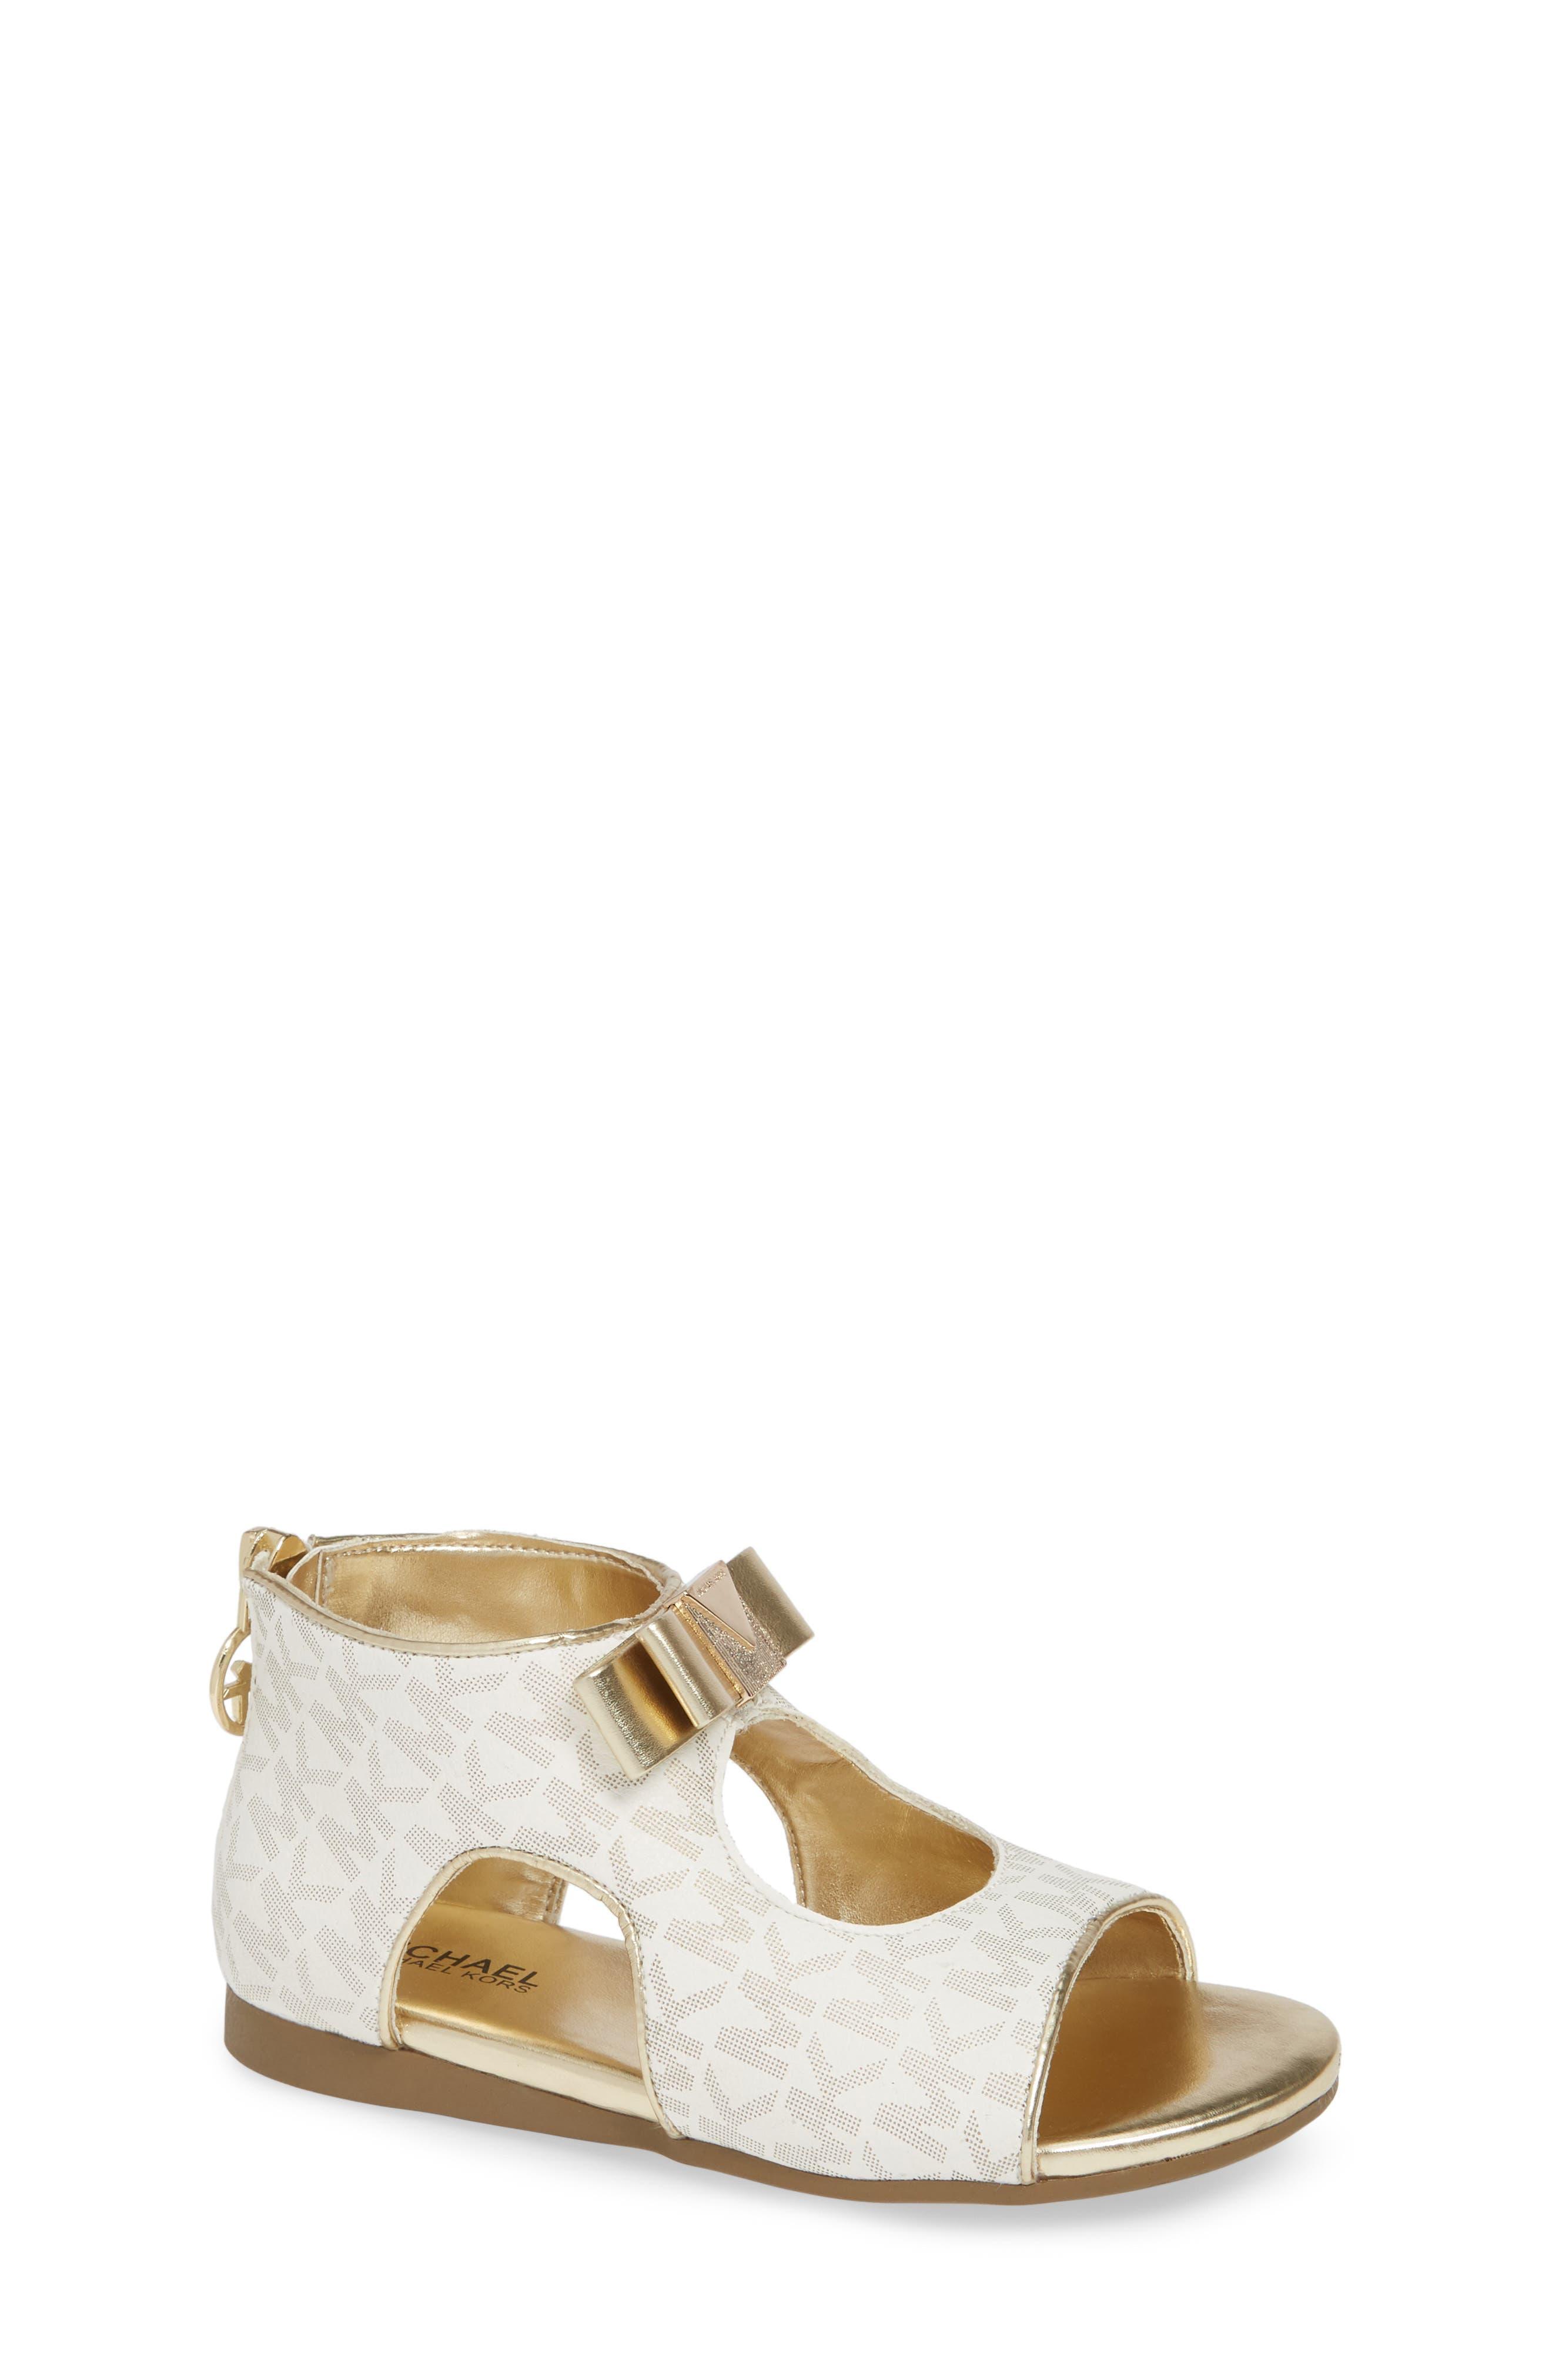 Tilly Dahna Logo Sandal, Main, color, GOLD/ WHITE